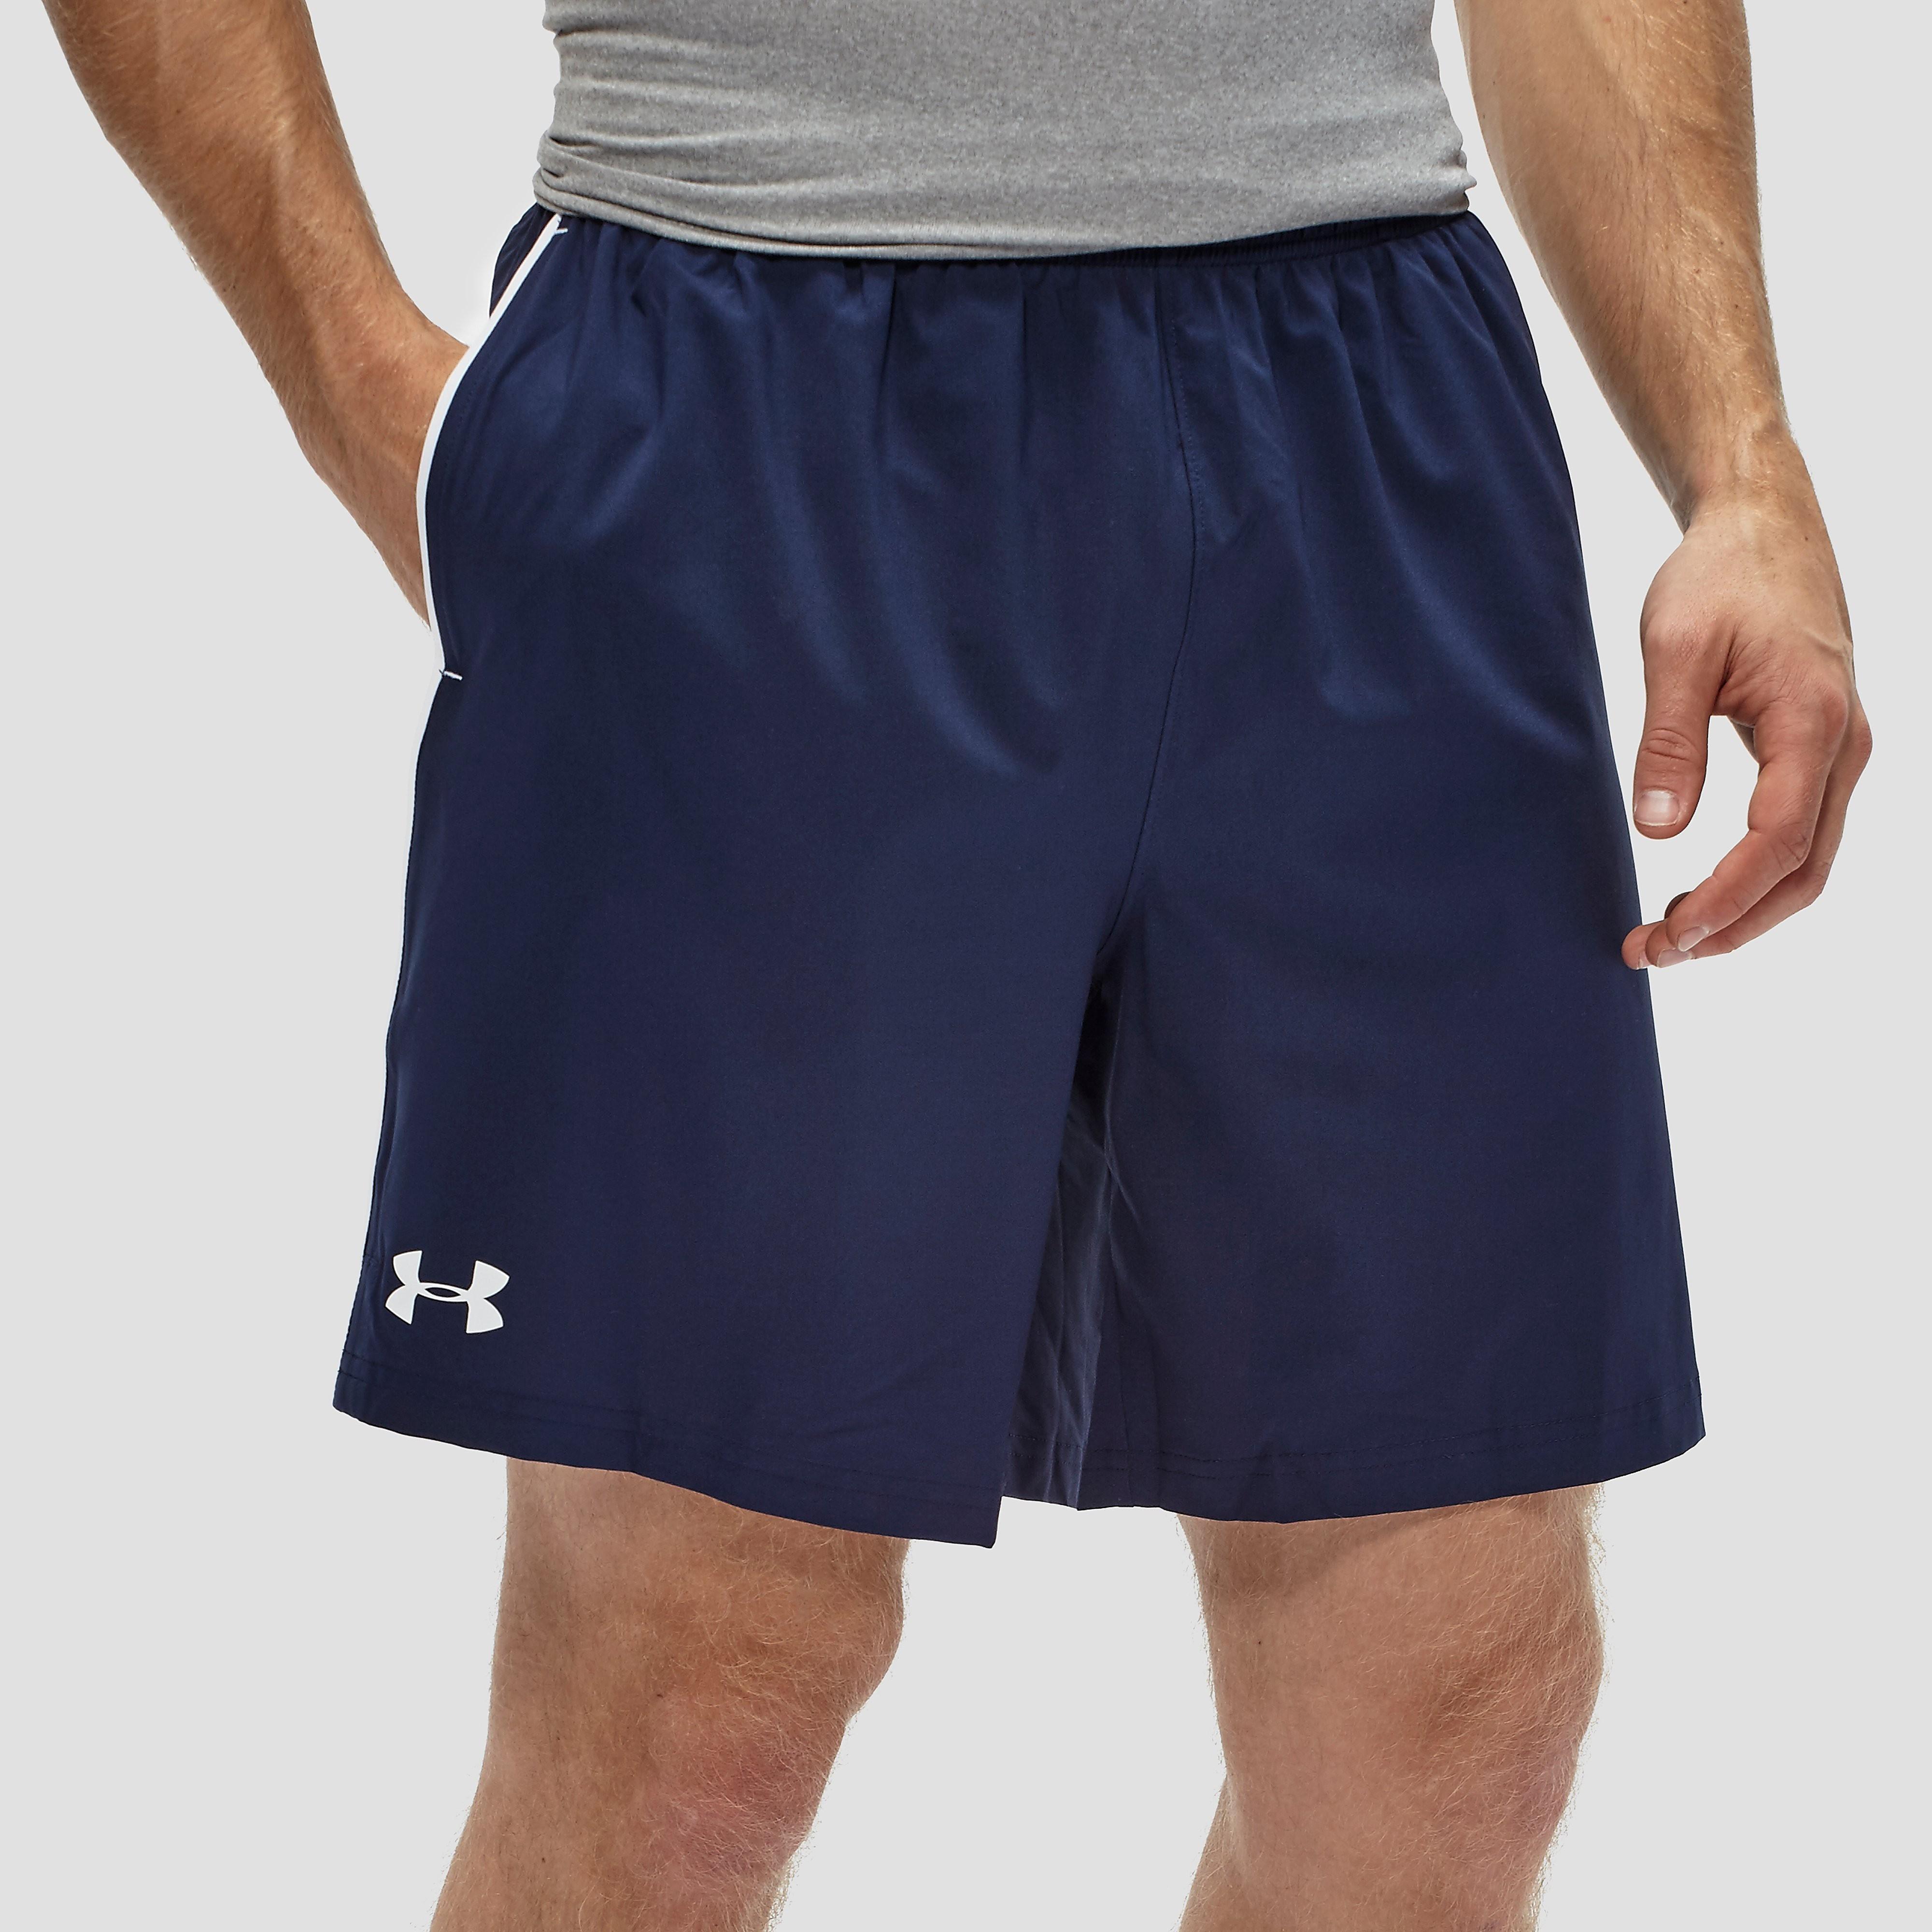 "Under Armour Mirage 8"" Men's Shorts"